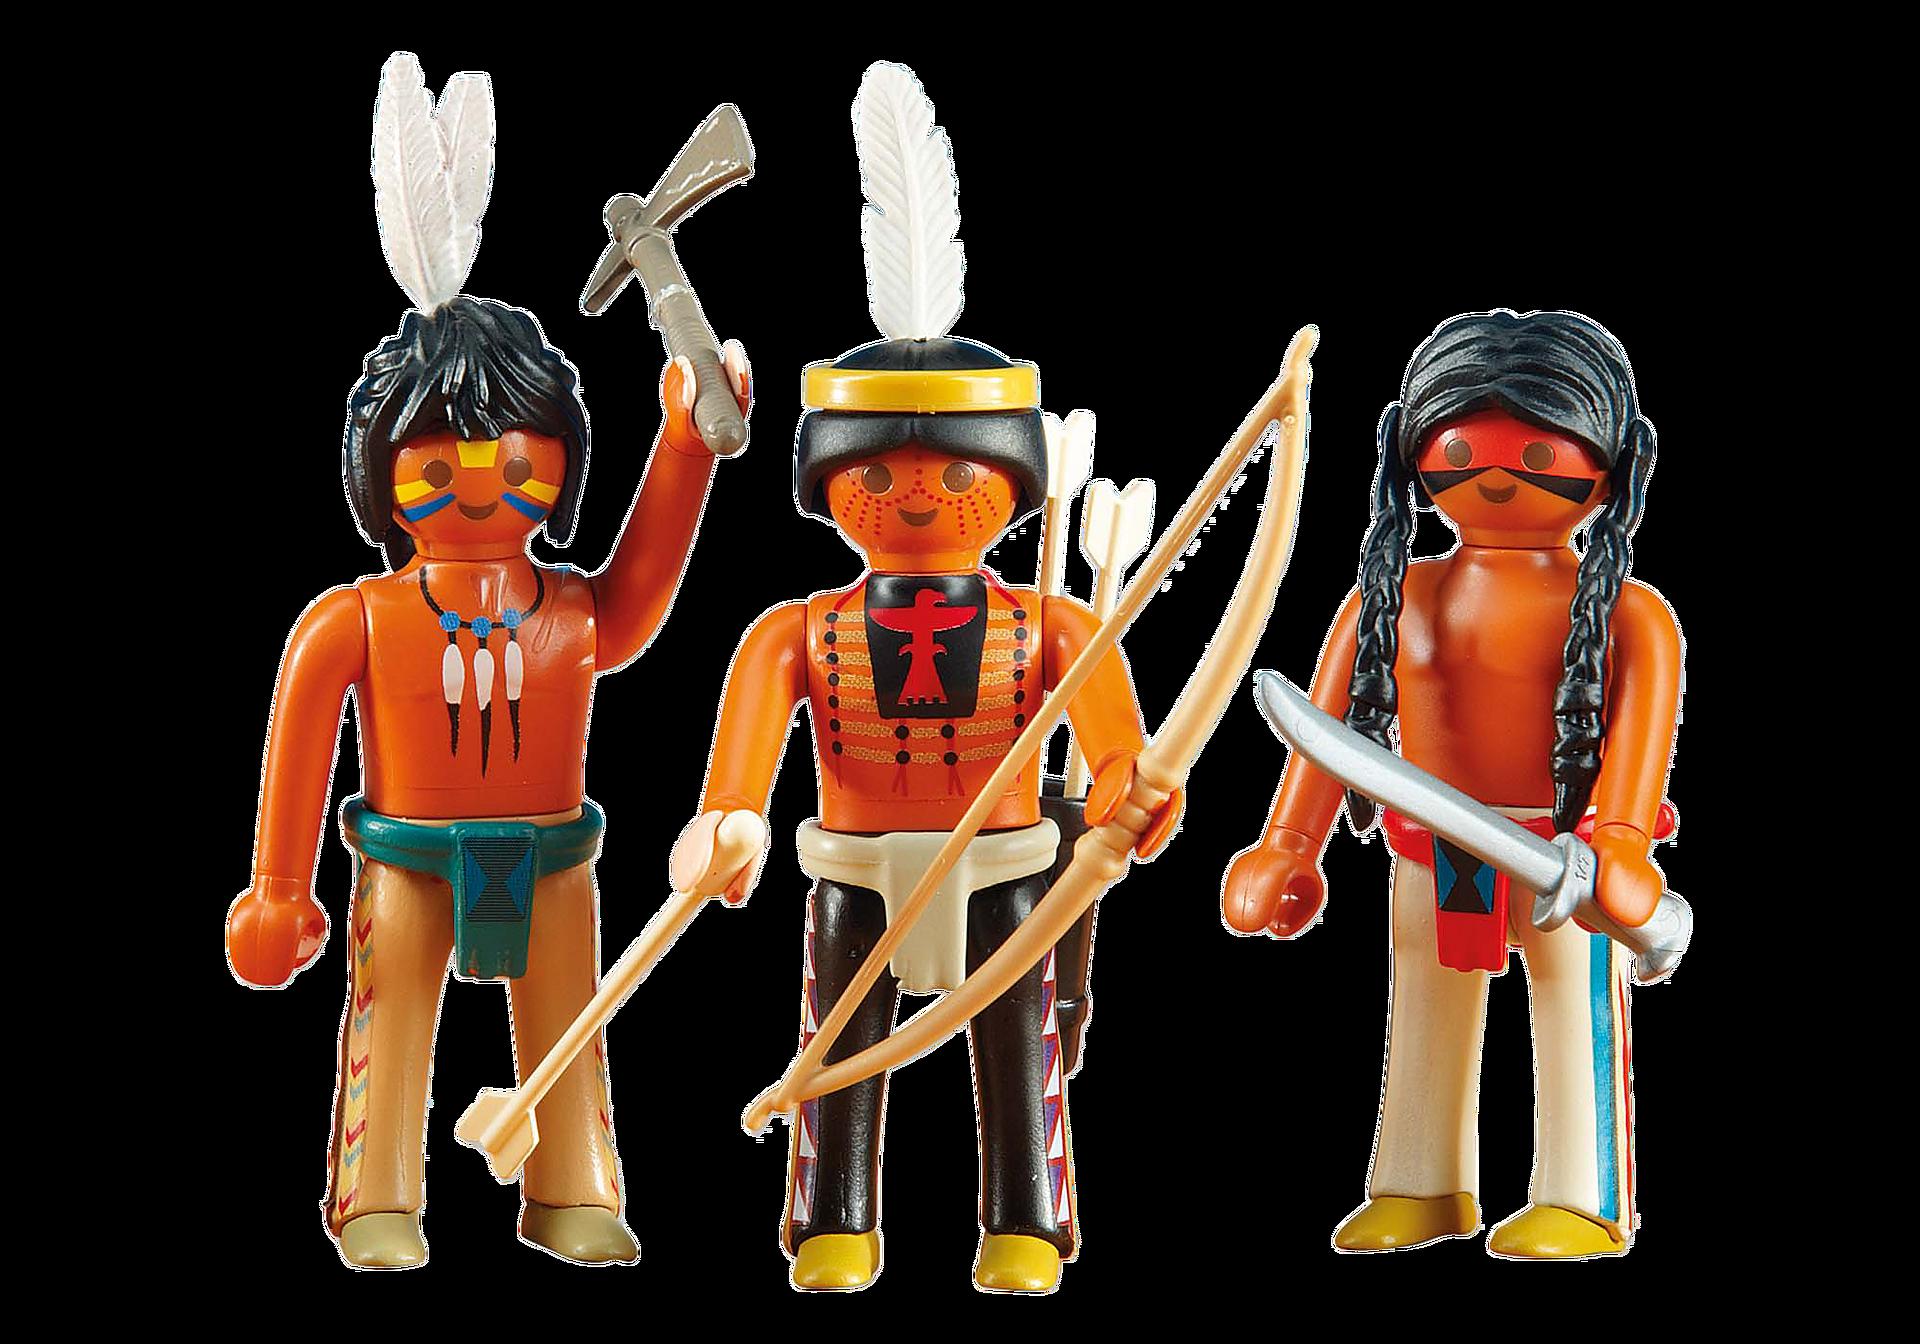 6272 3 Guerriers amérindiens zoom image1